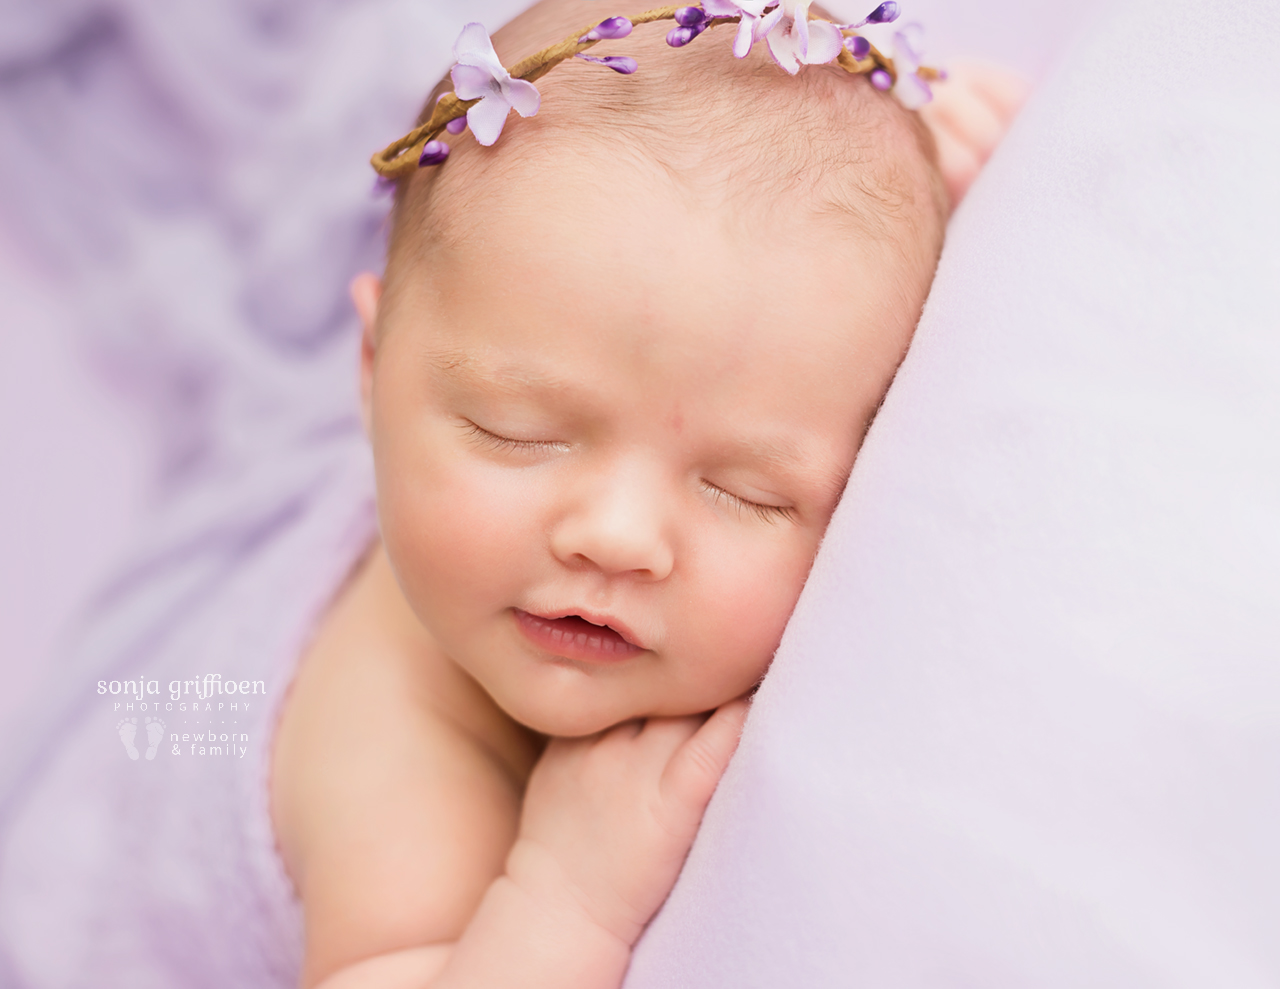 Macey-Newborn-Brisbane-Newborn-Photographer-Sonja-Griffioen-10.jpg